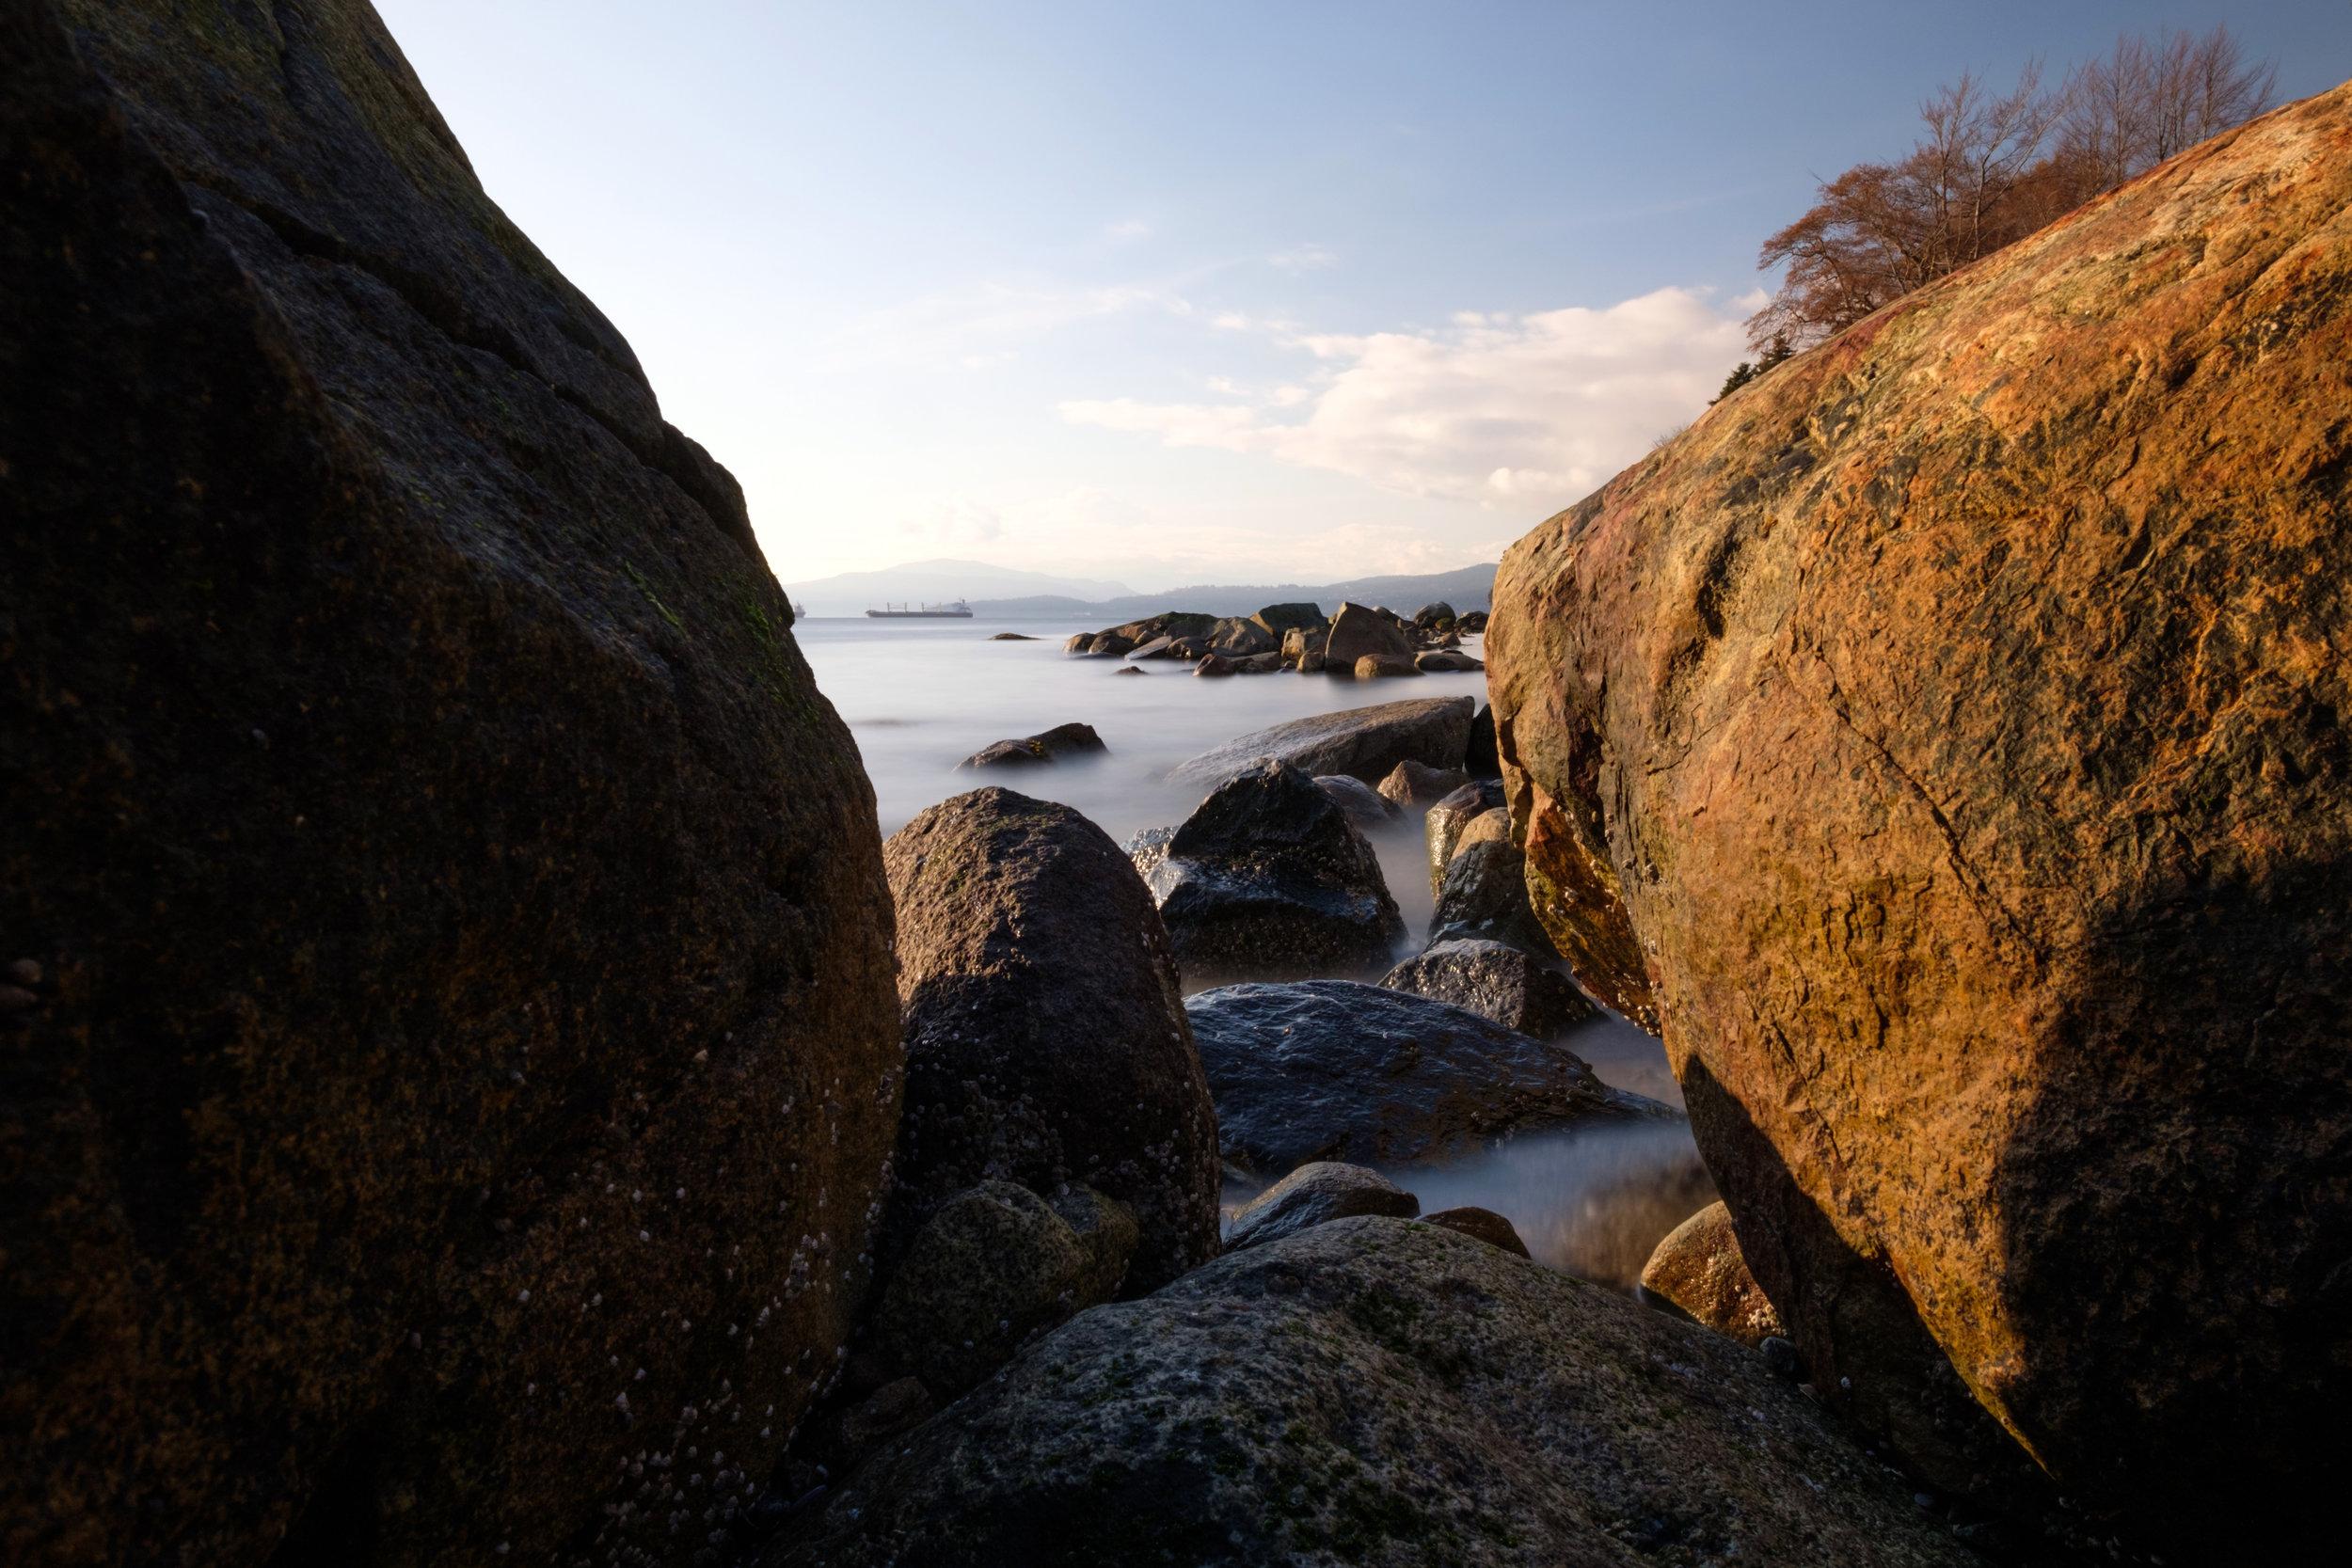 English Bay, Vancouver,  Canada , Fujifilm X-H1, XF 14mm f/2.8 R @ f/14